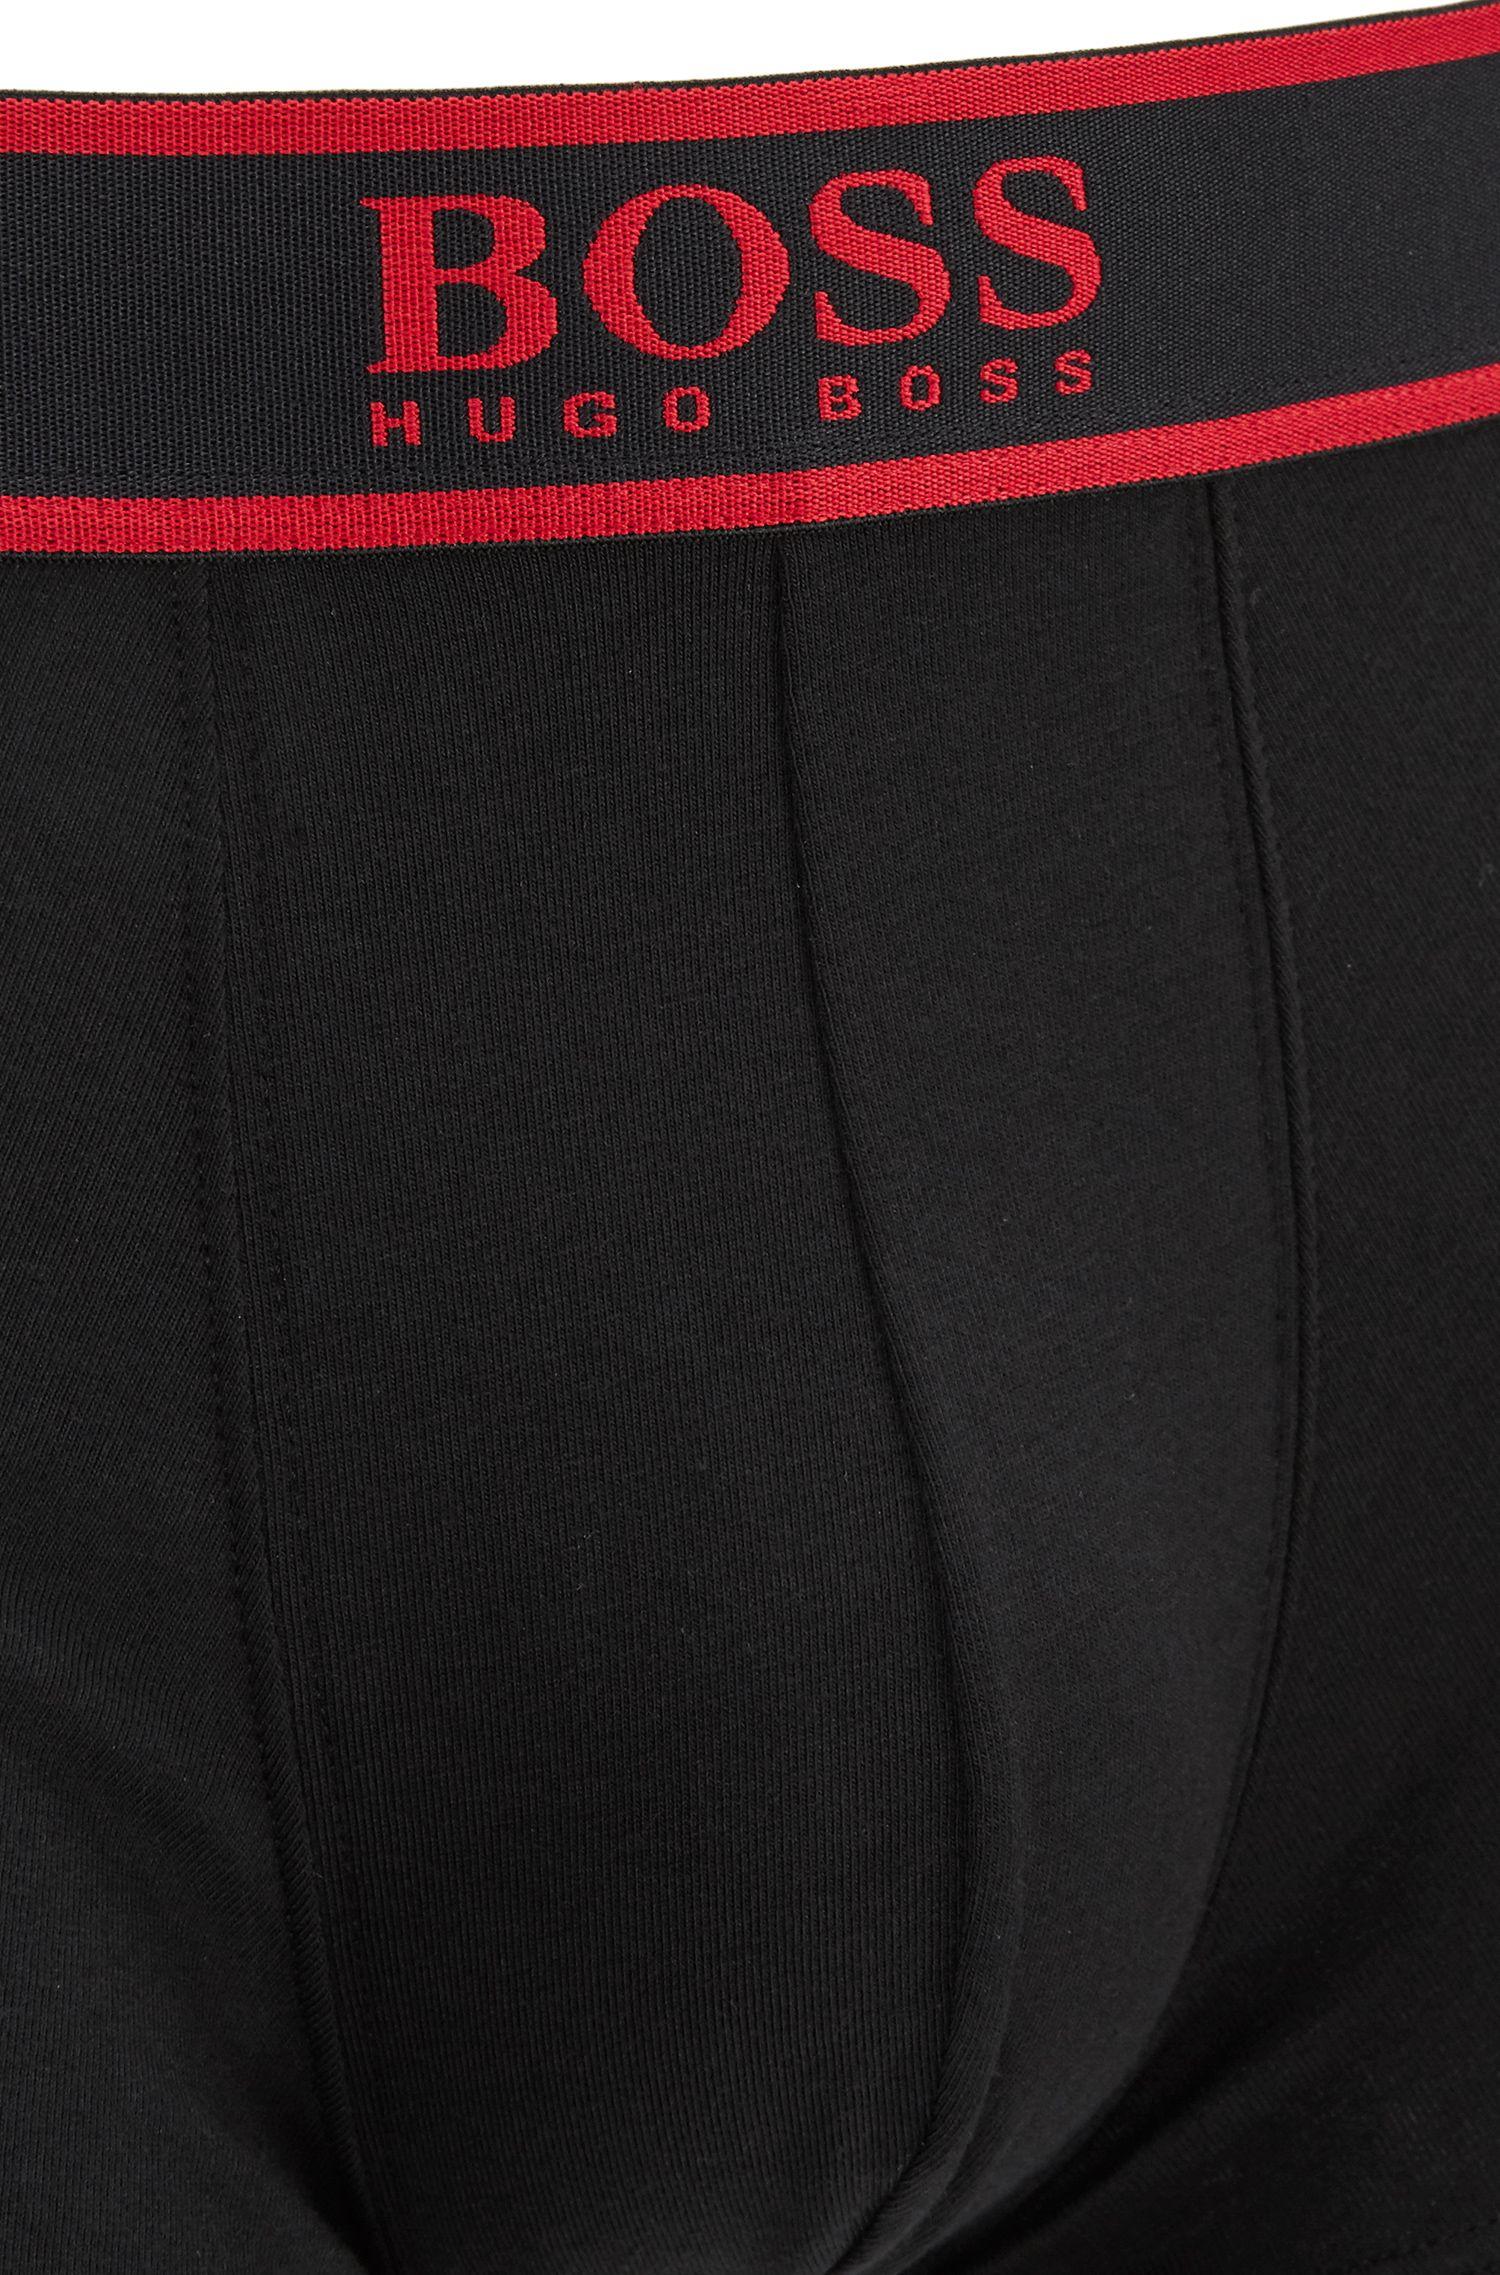 Stretch Cotton Jersey Trunk | Trunk Contrast